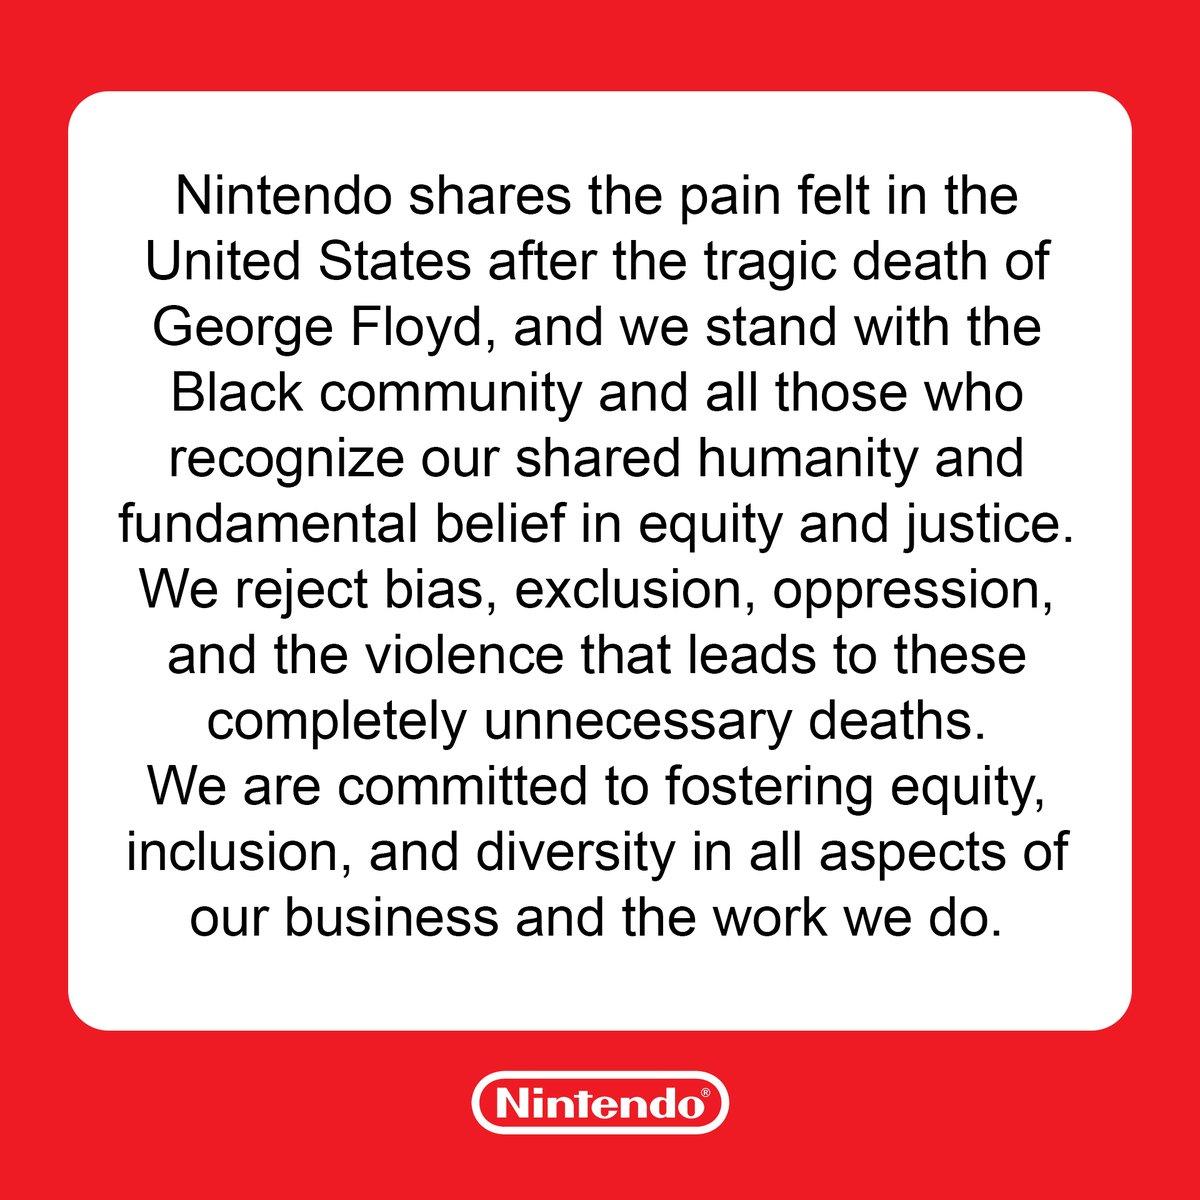 Replying to @NintendoAmerica: